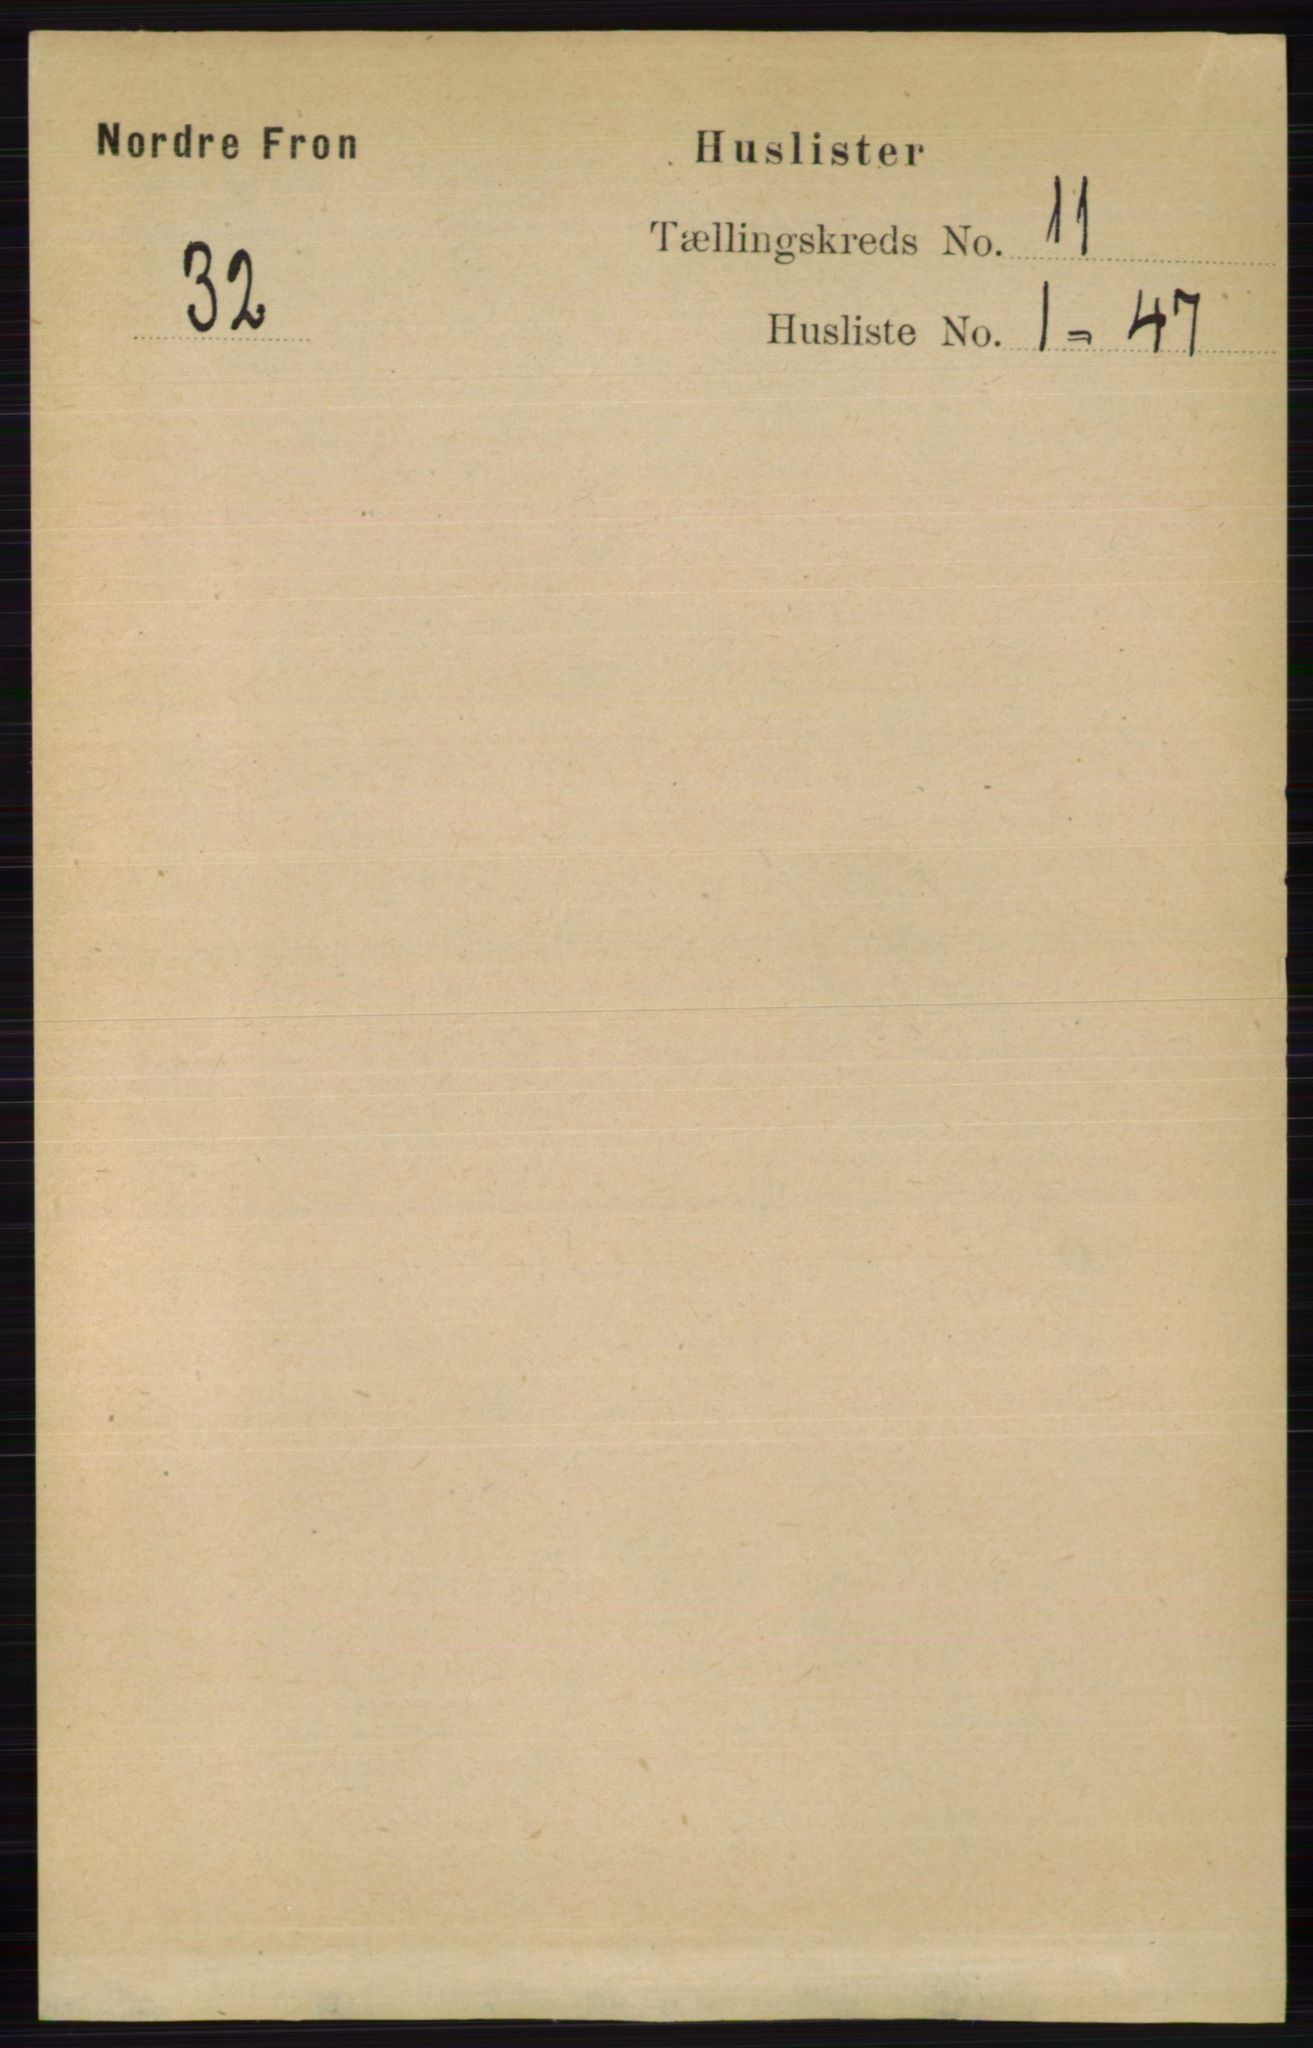 RA, Folketelling 1891 for 0518 Nord-Fron herred, 1891, s. 4780